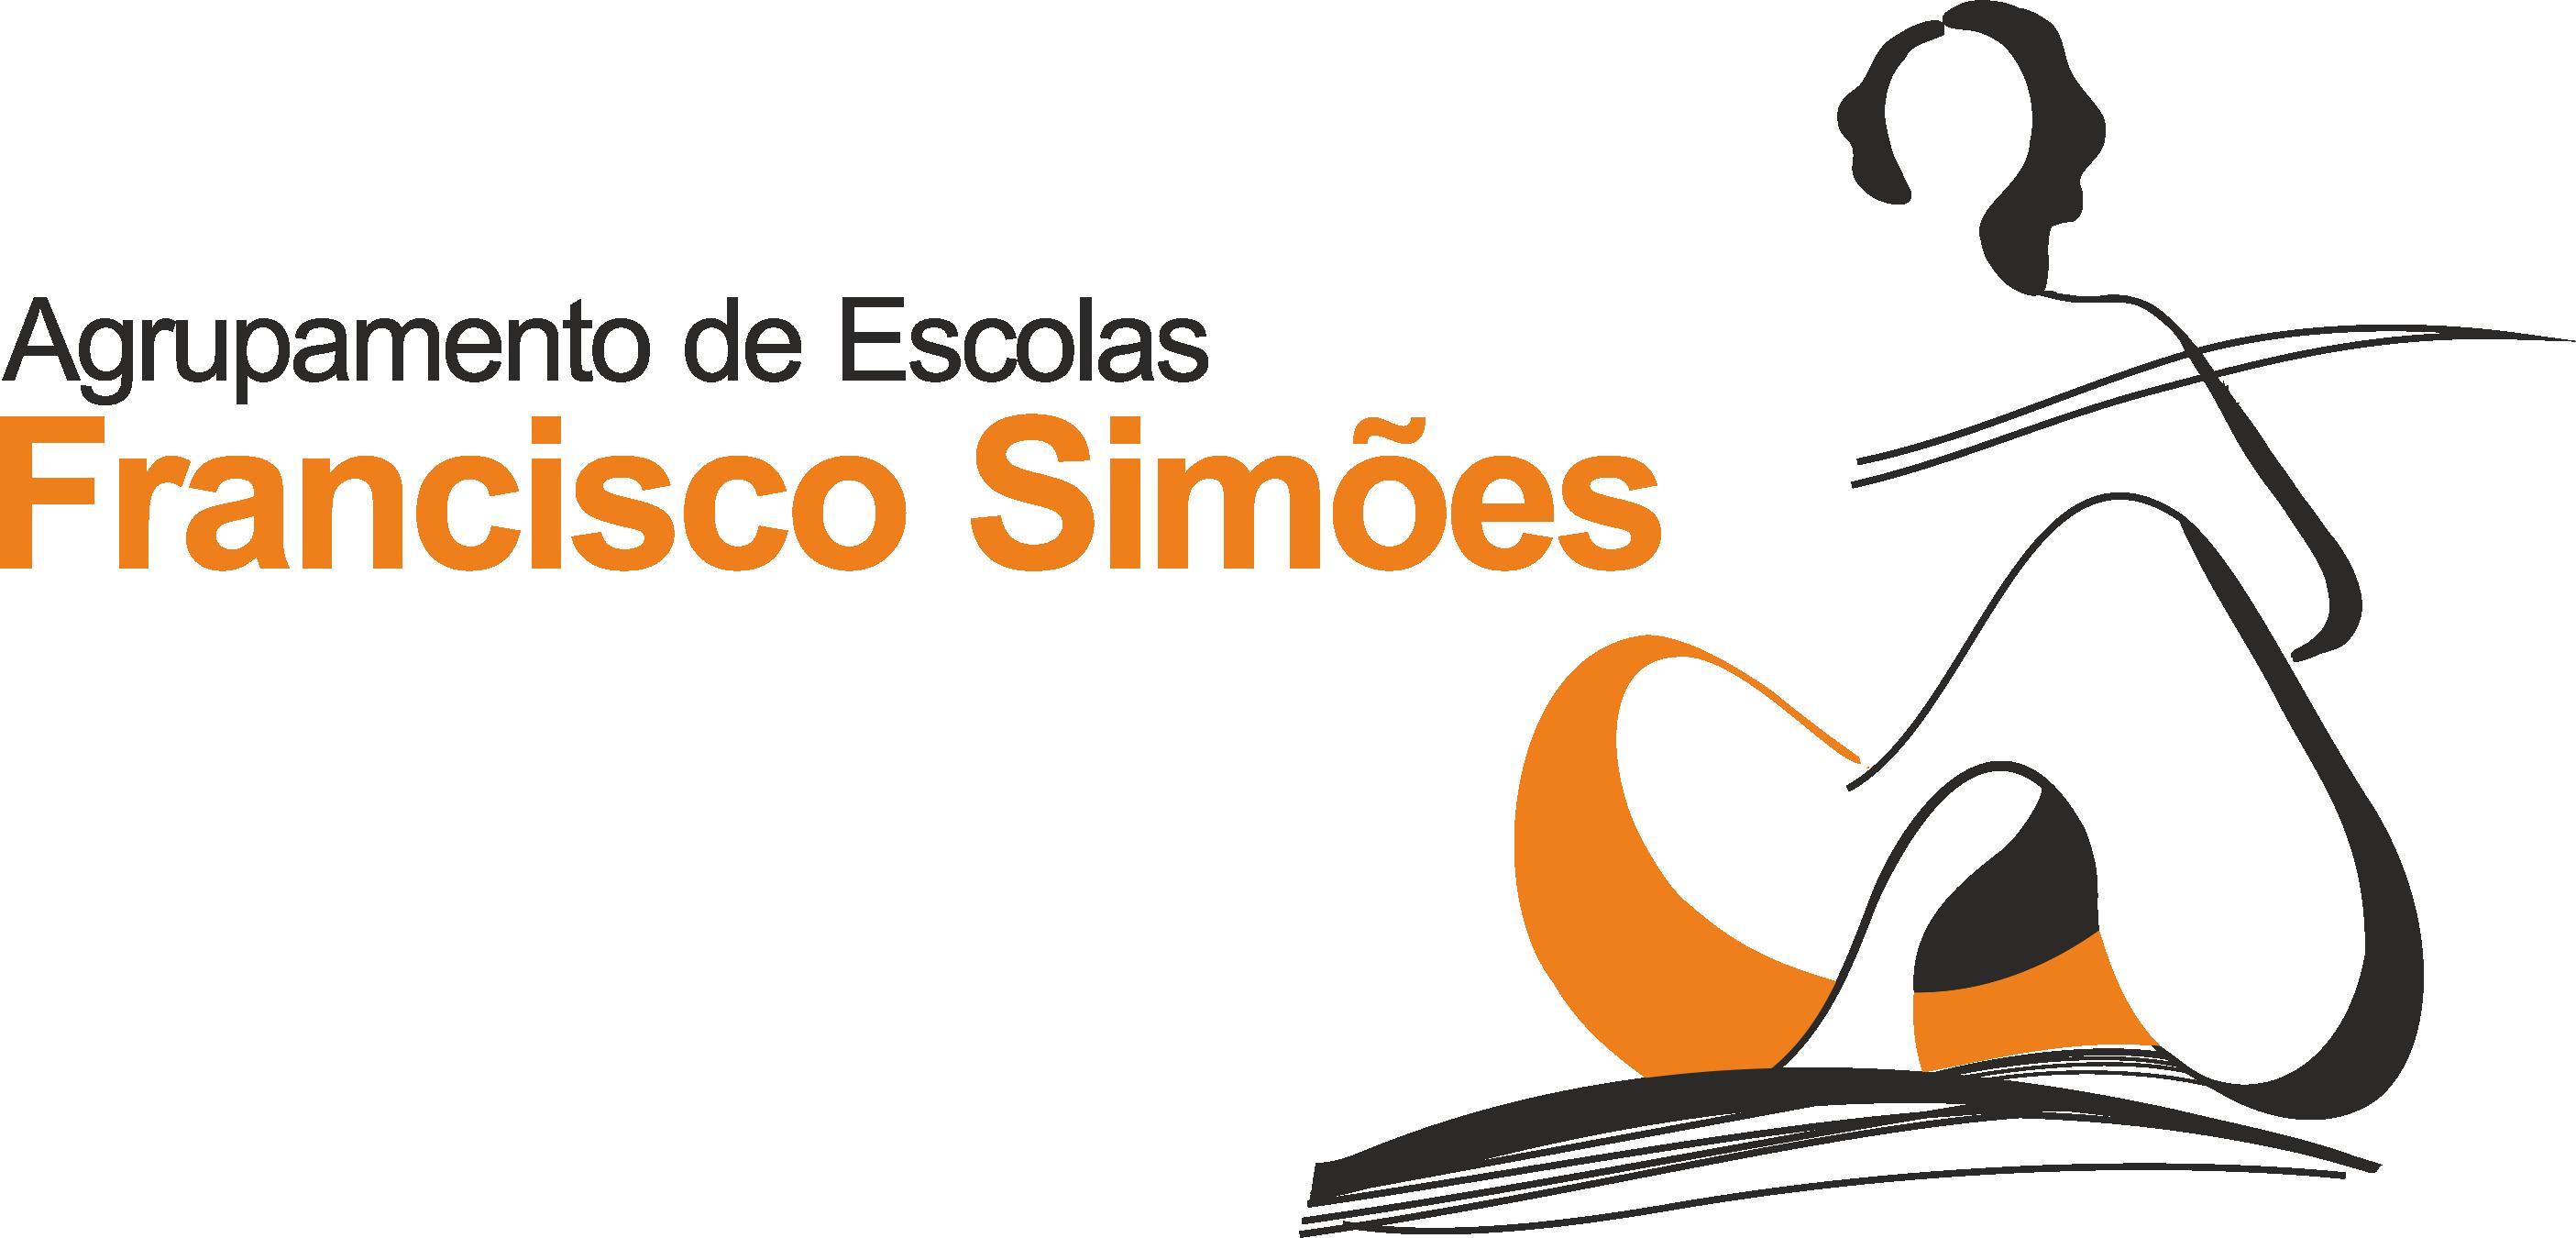 Agrupamento de Escolas Francisco Simões